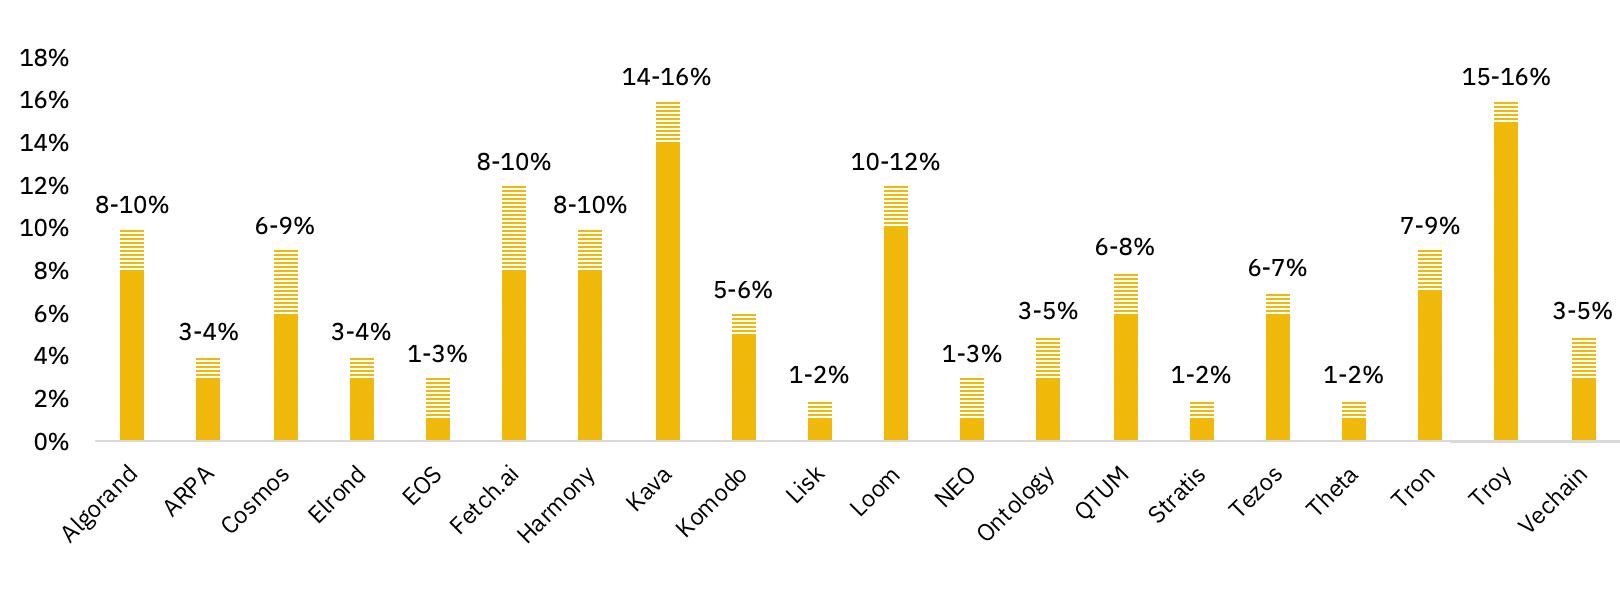 Staking yields March 2020 Binance